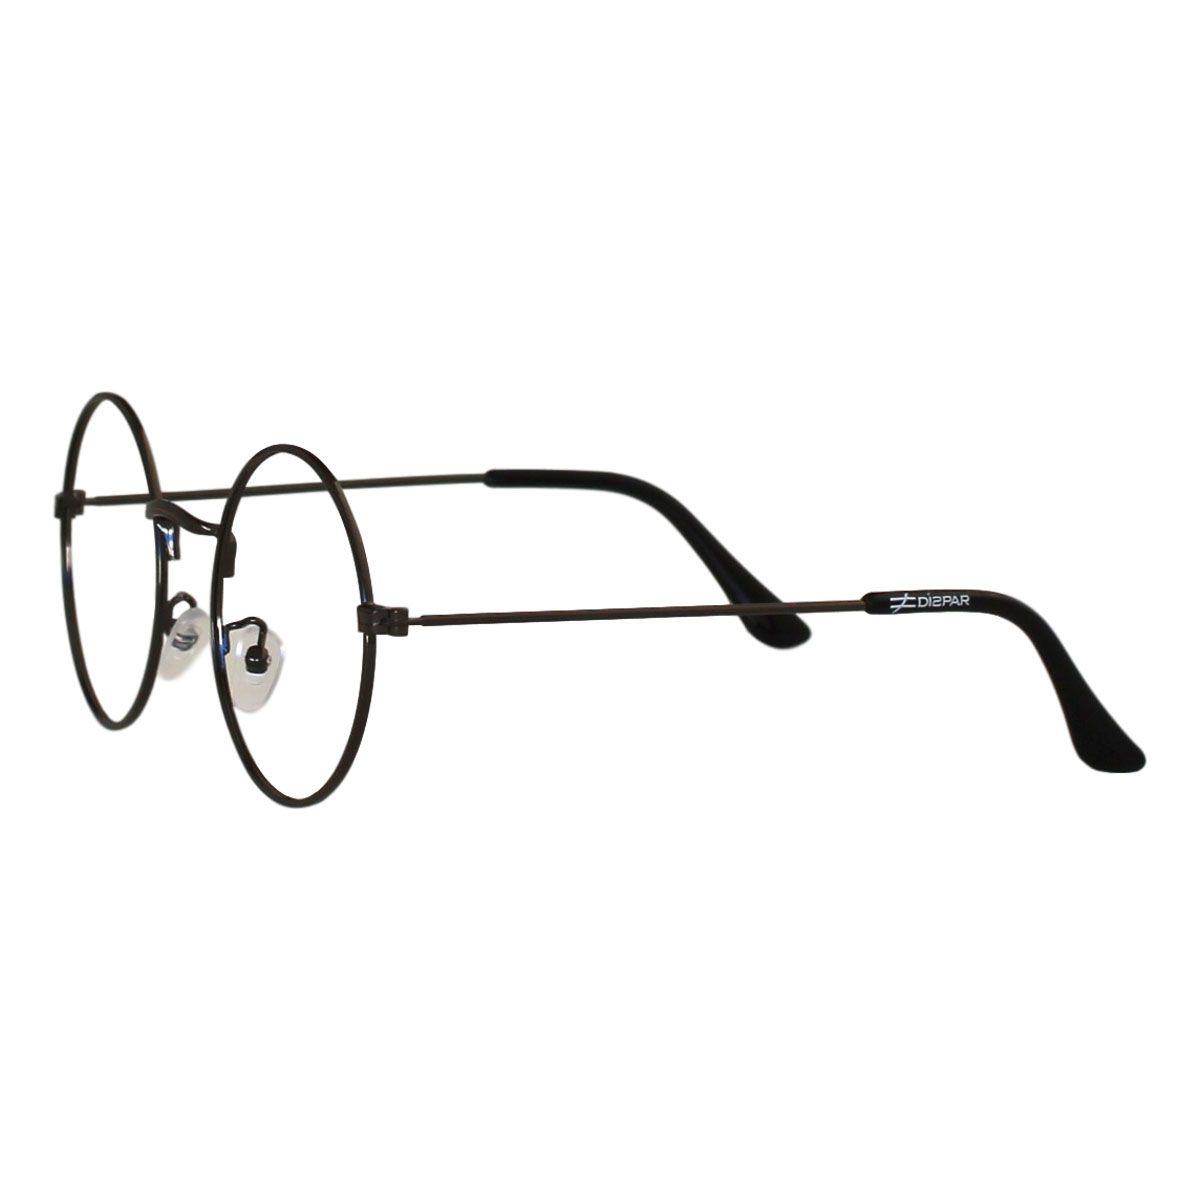 Armação para Óculos Díspar D1646 Chumbo